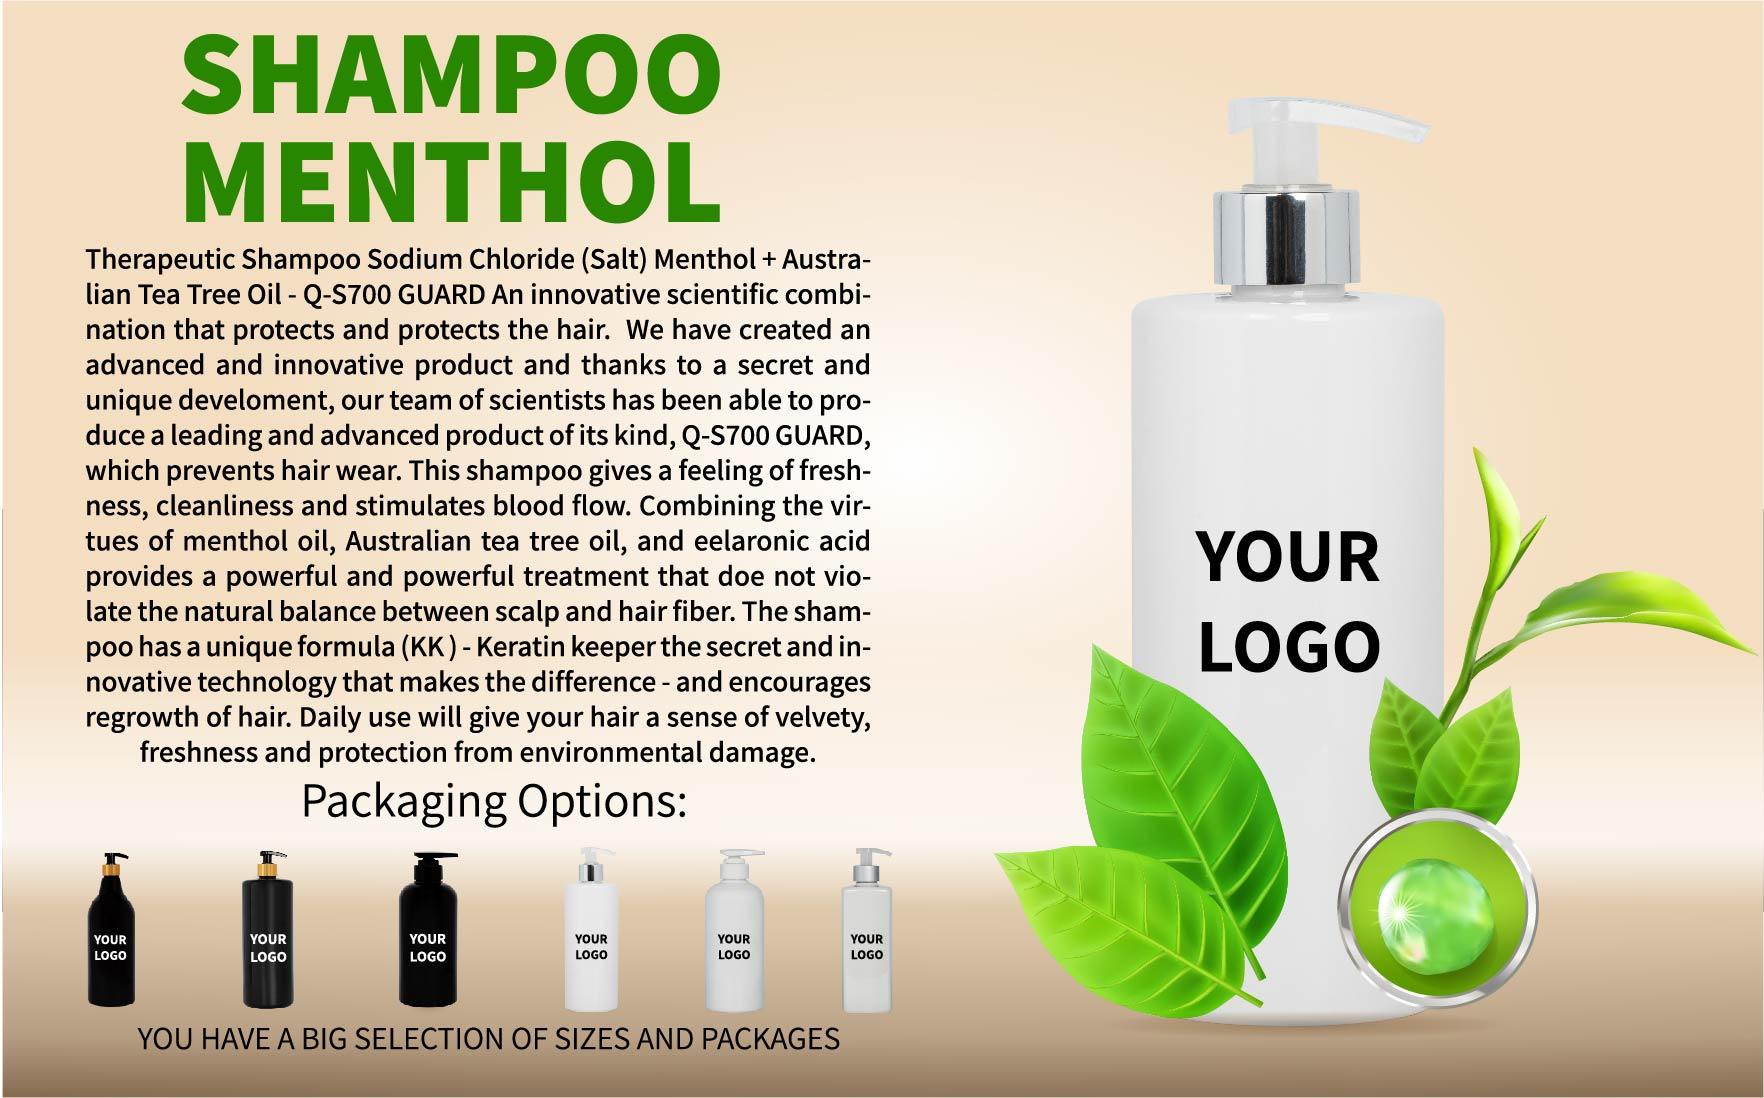 shampoo menthol-01